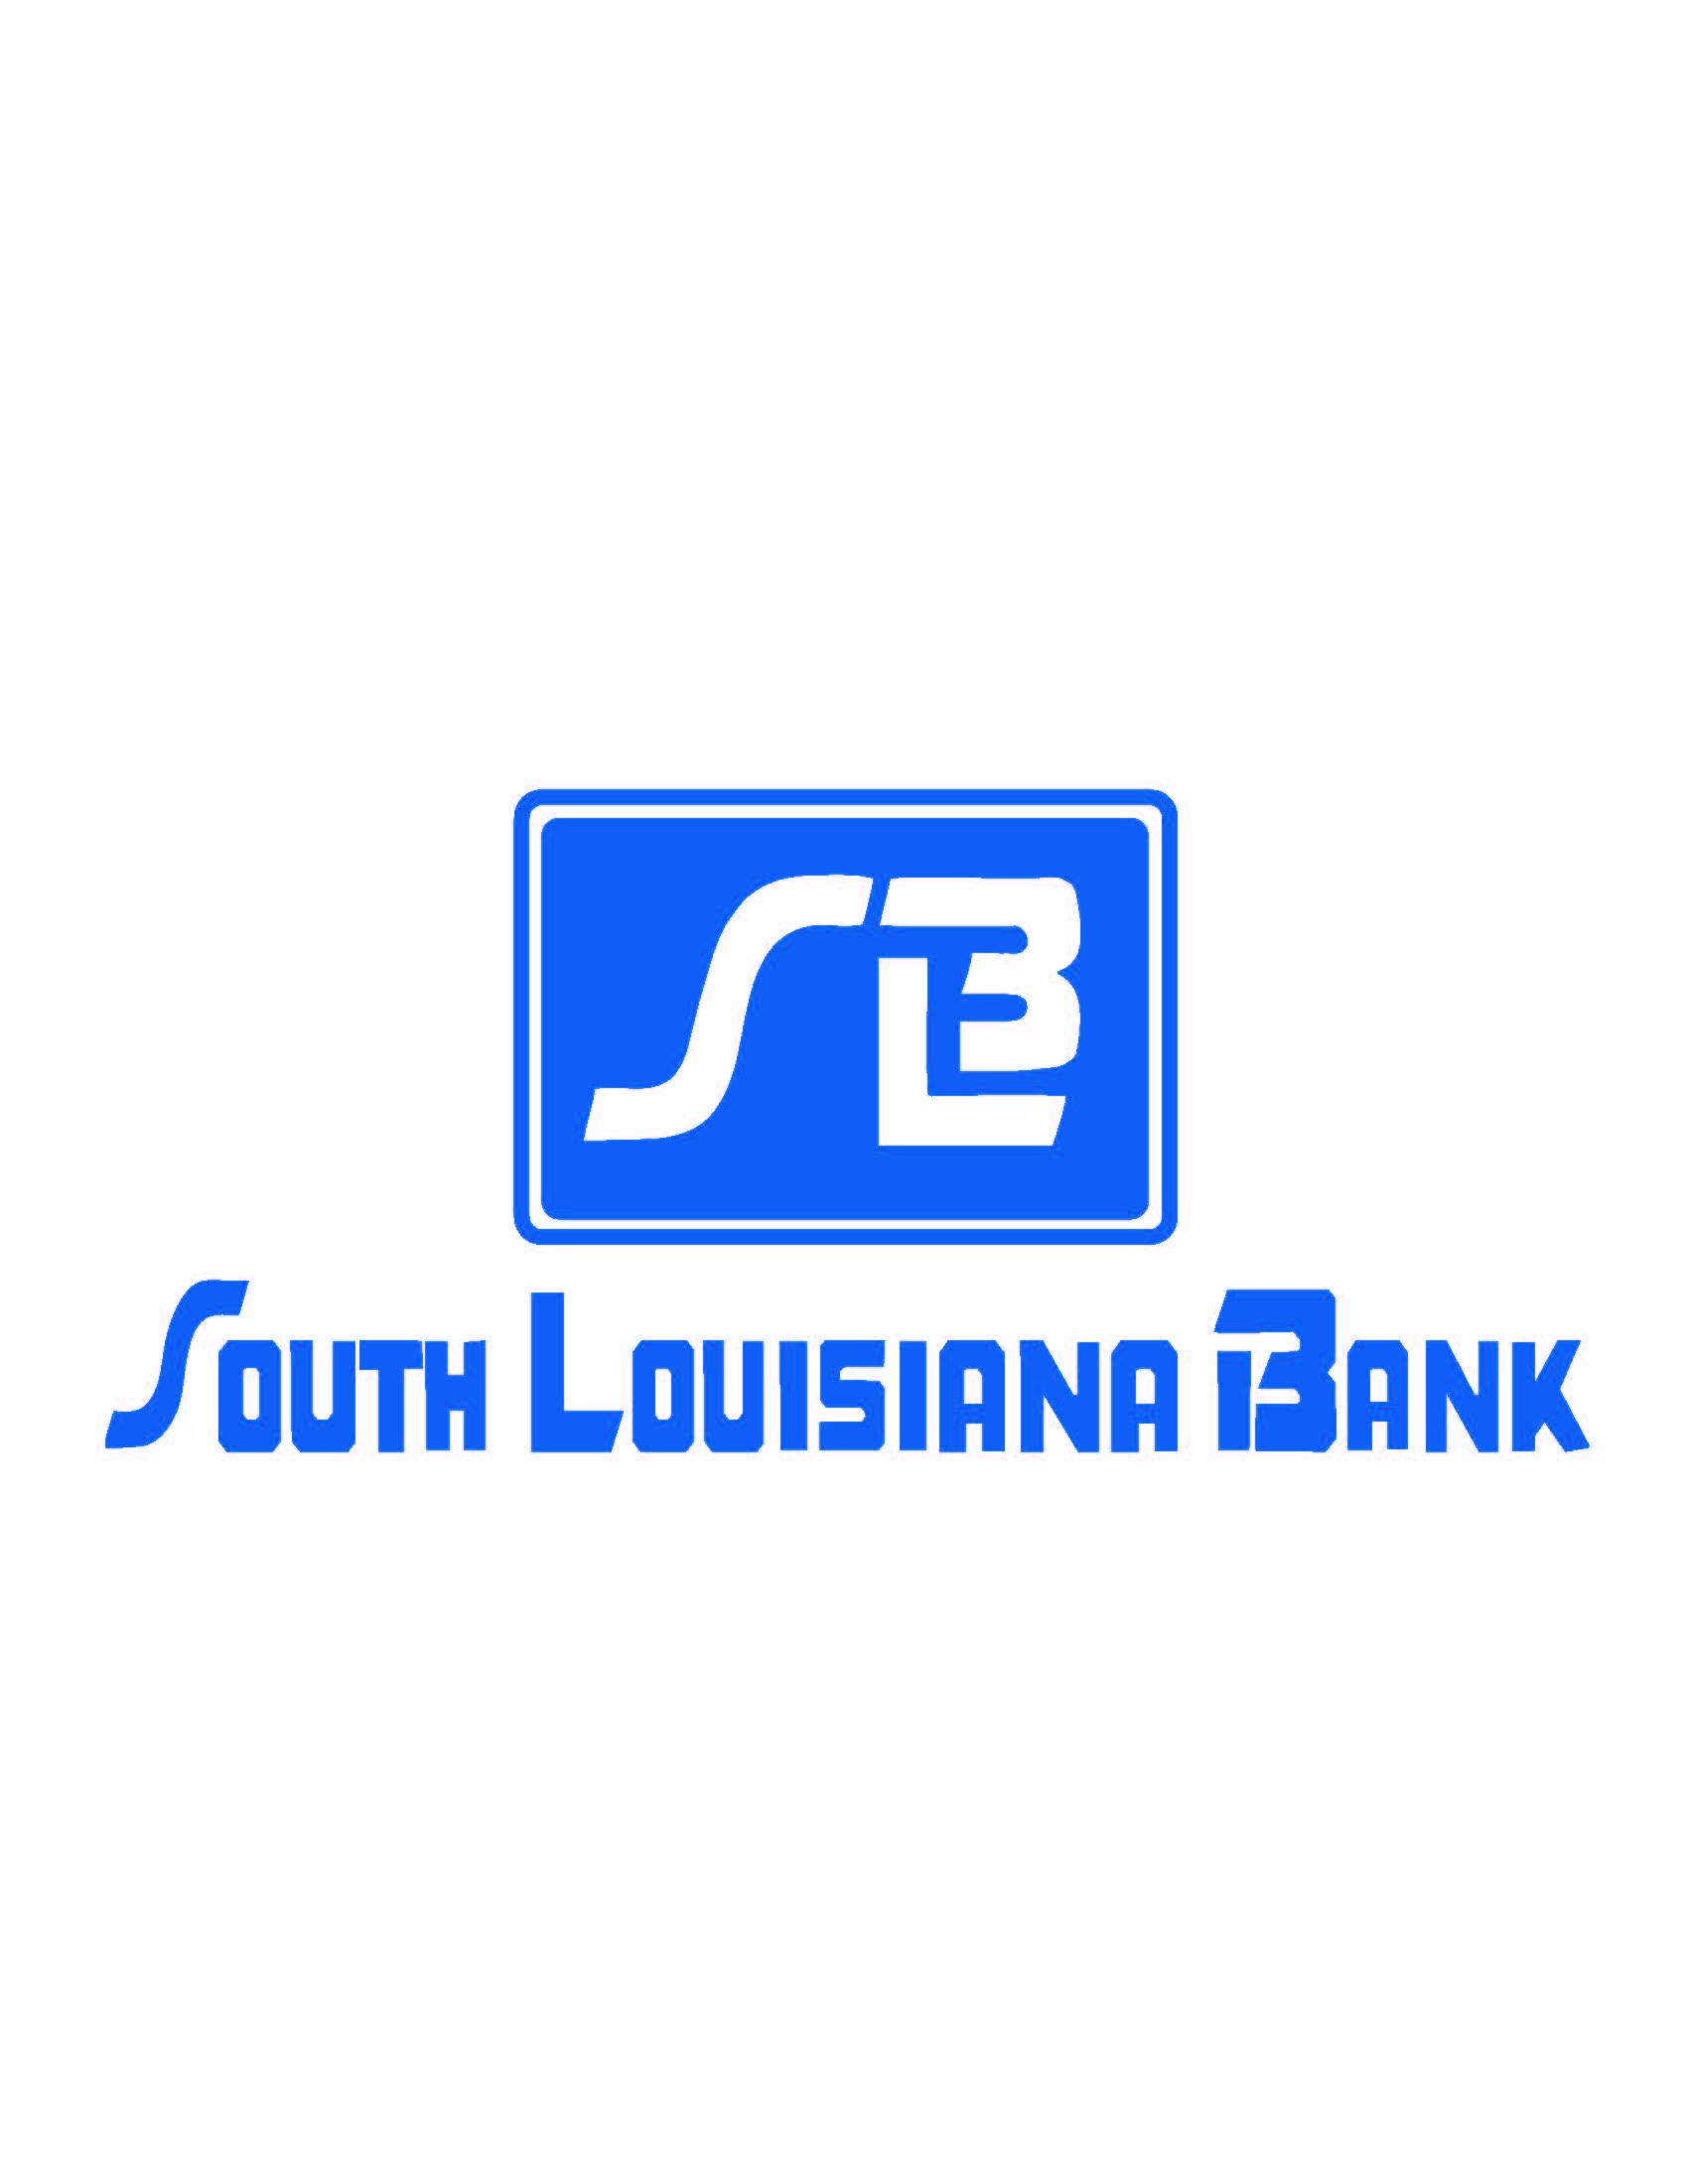 South Louisiana Bank logo